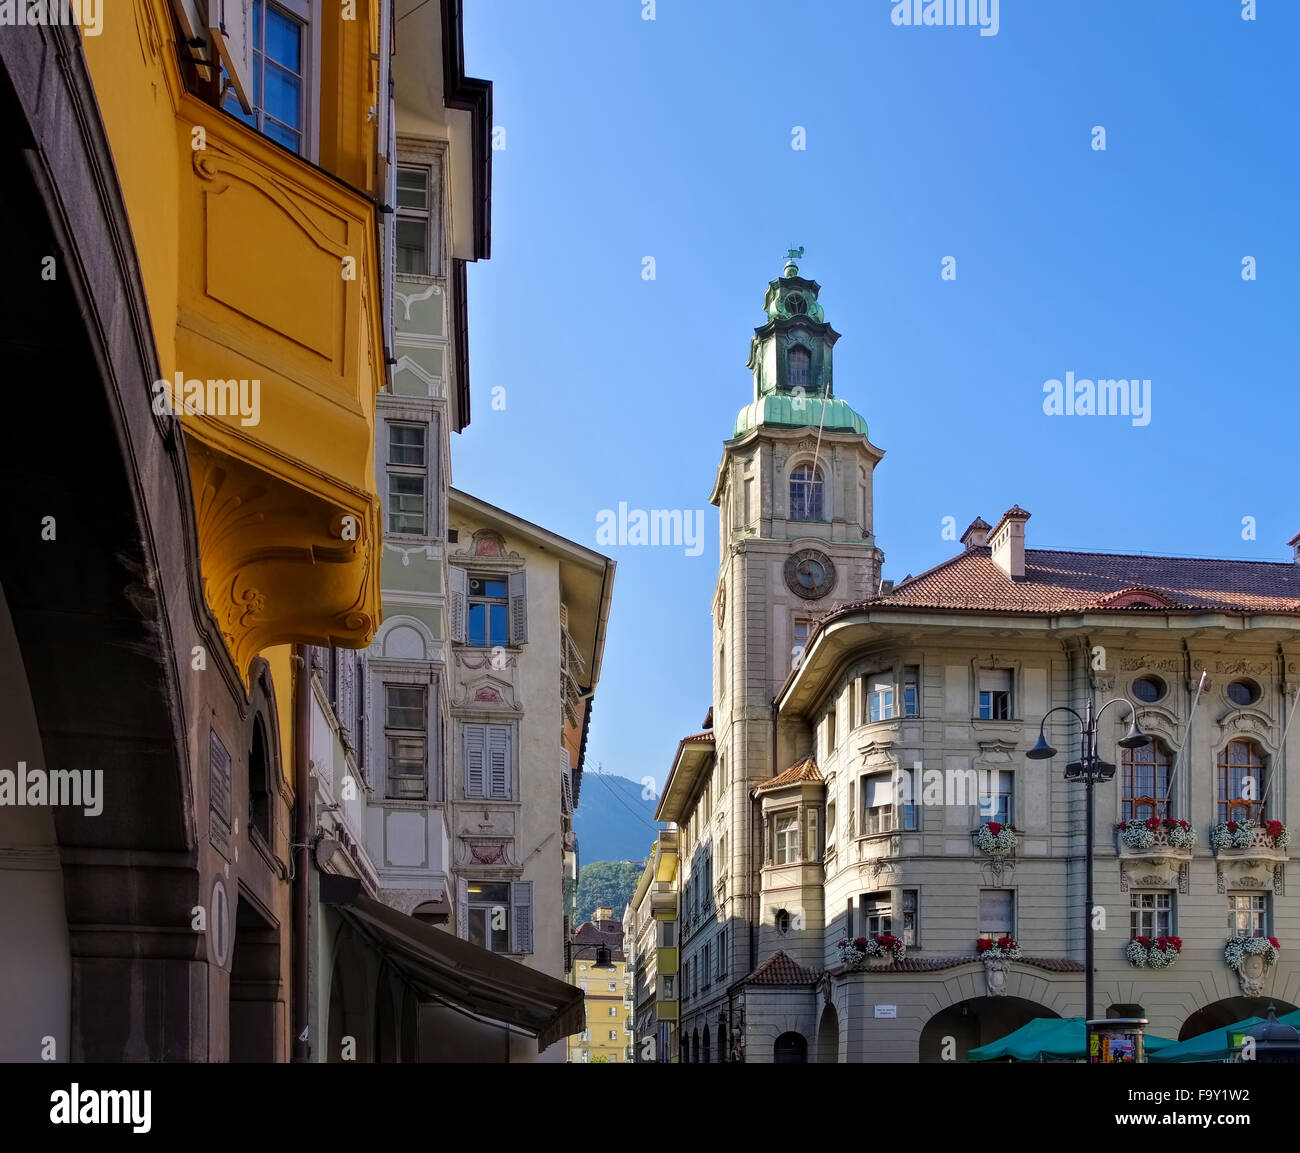 Bozen Rathaus - Bolzano townhall 01 - Stock Image